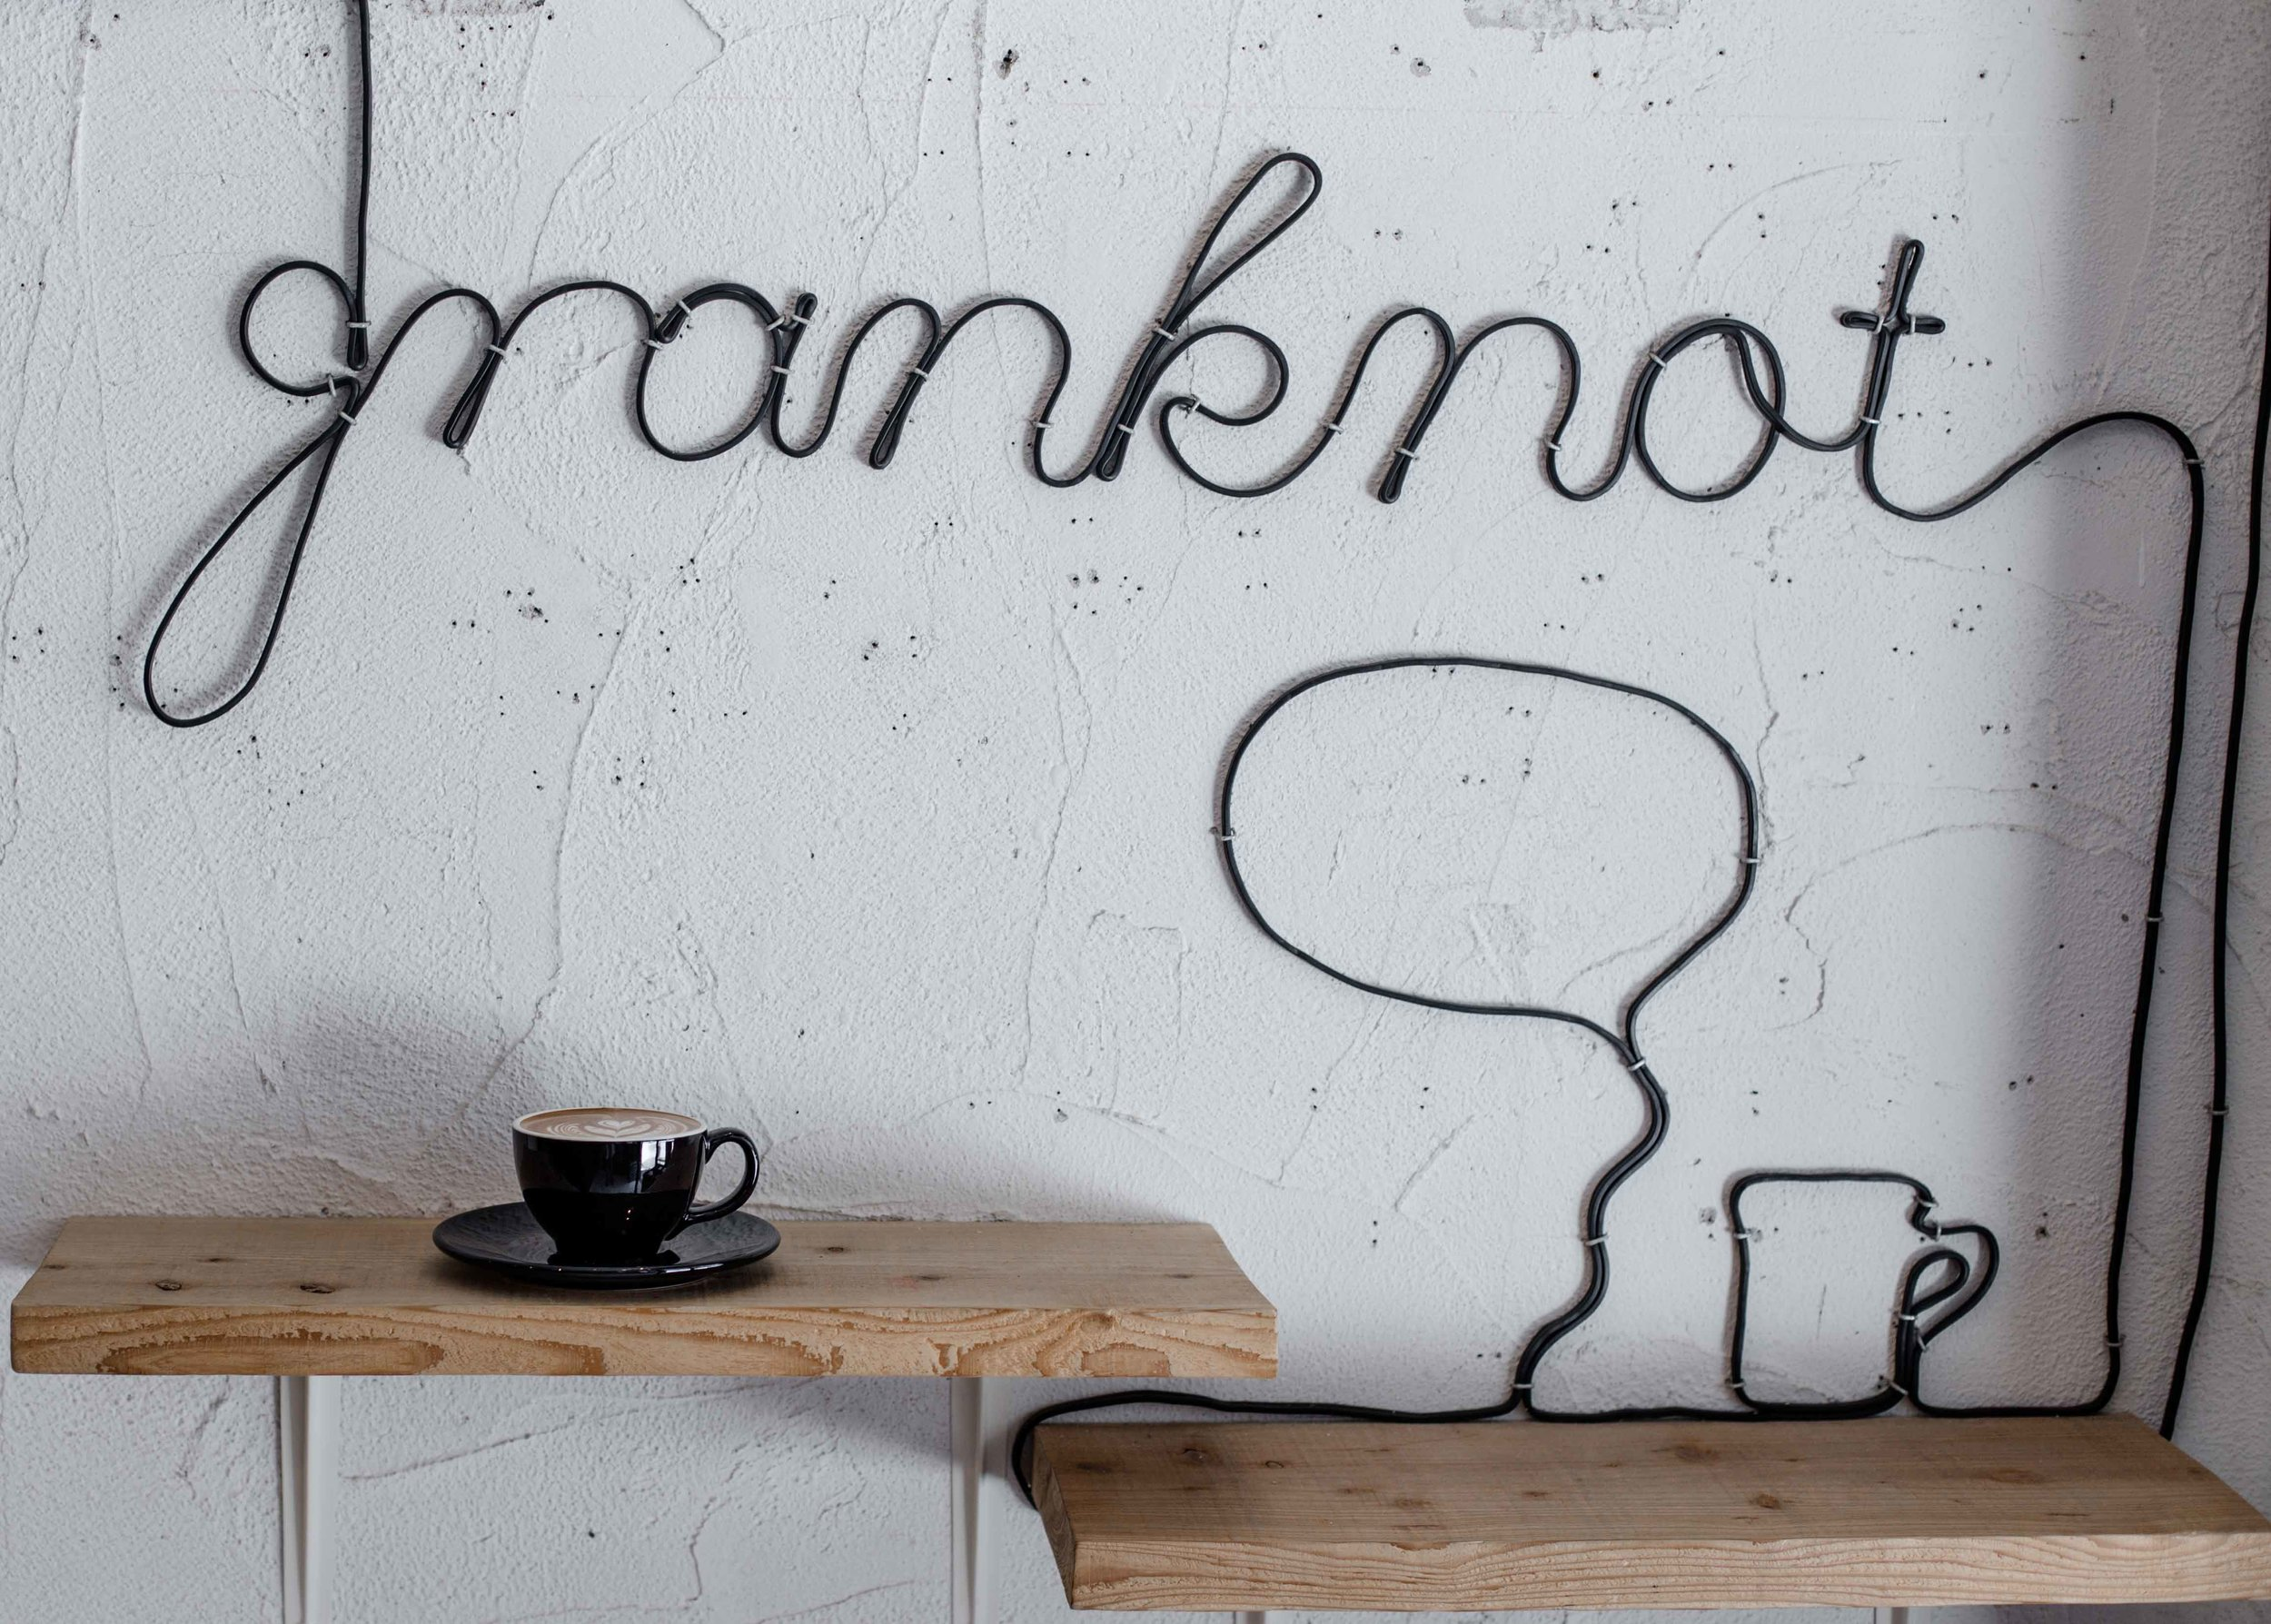 Granknot Specialty Coffee Shop Osaka Japan